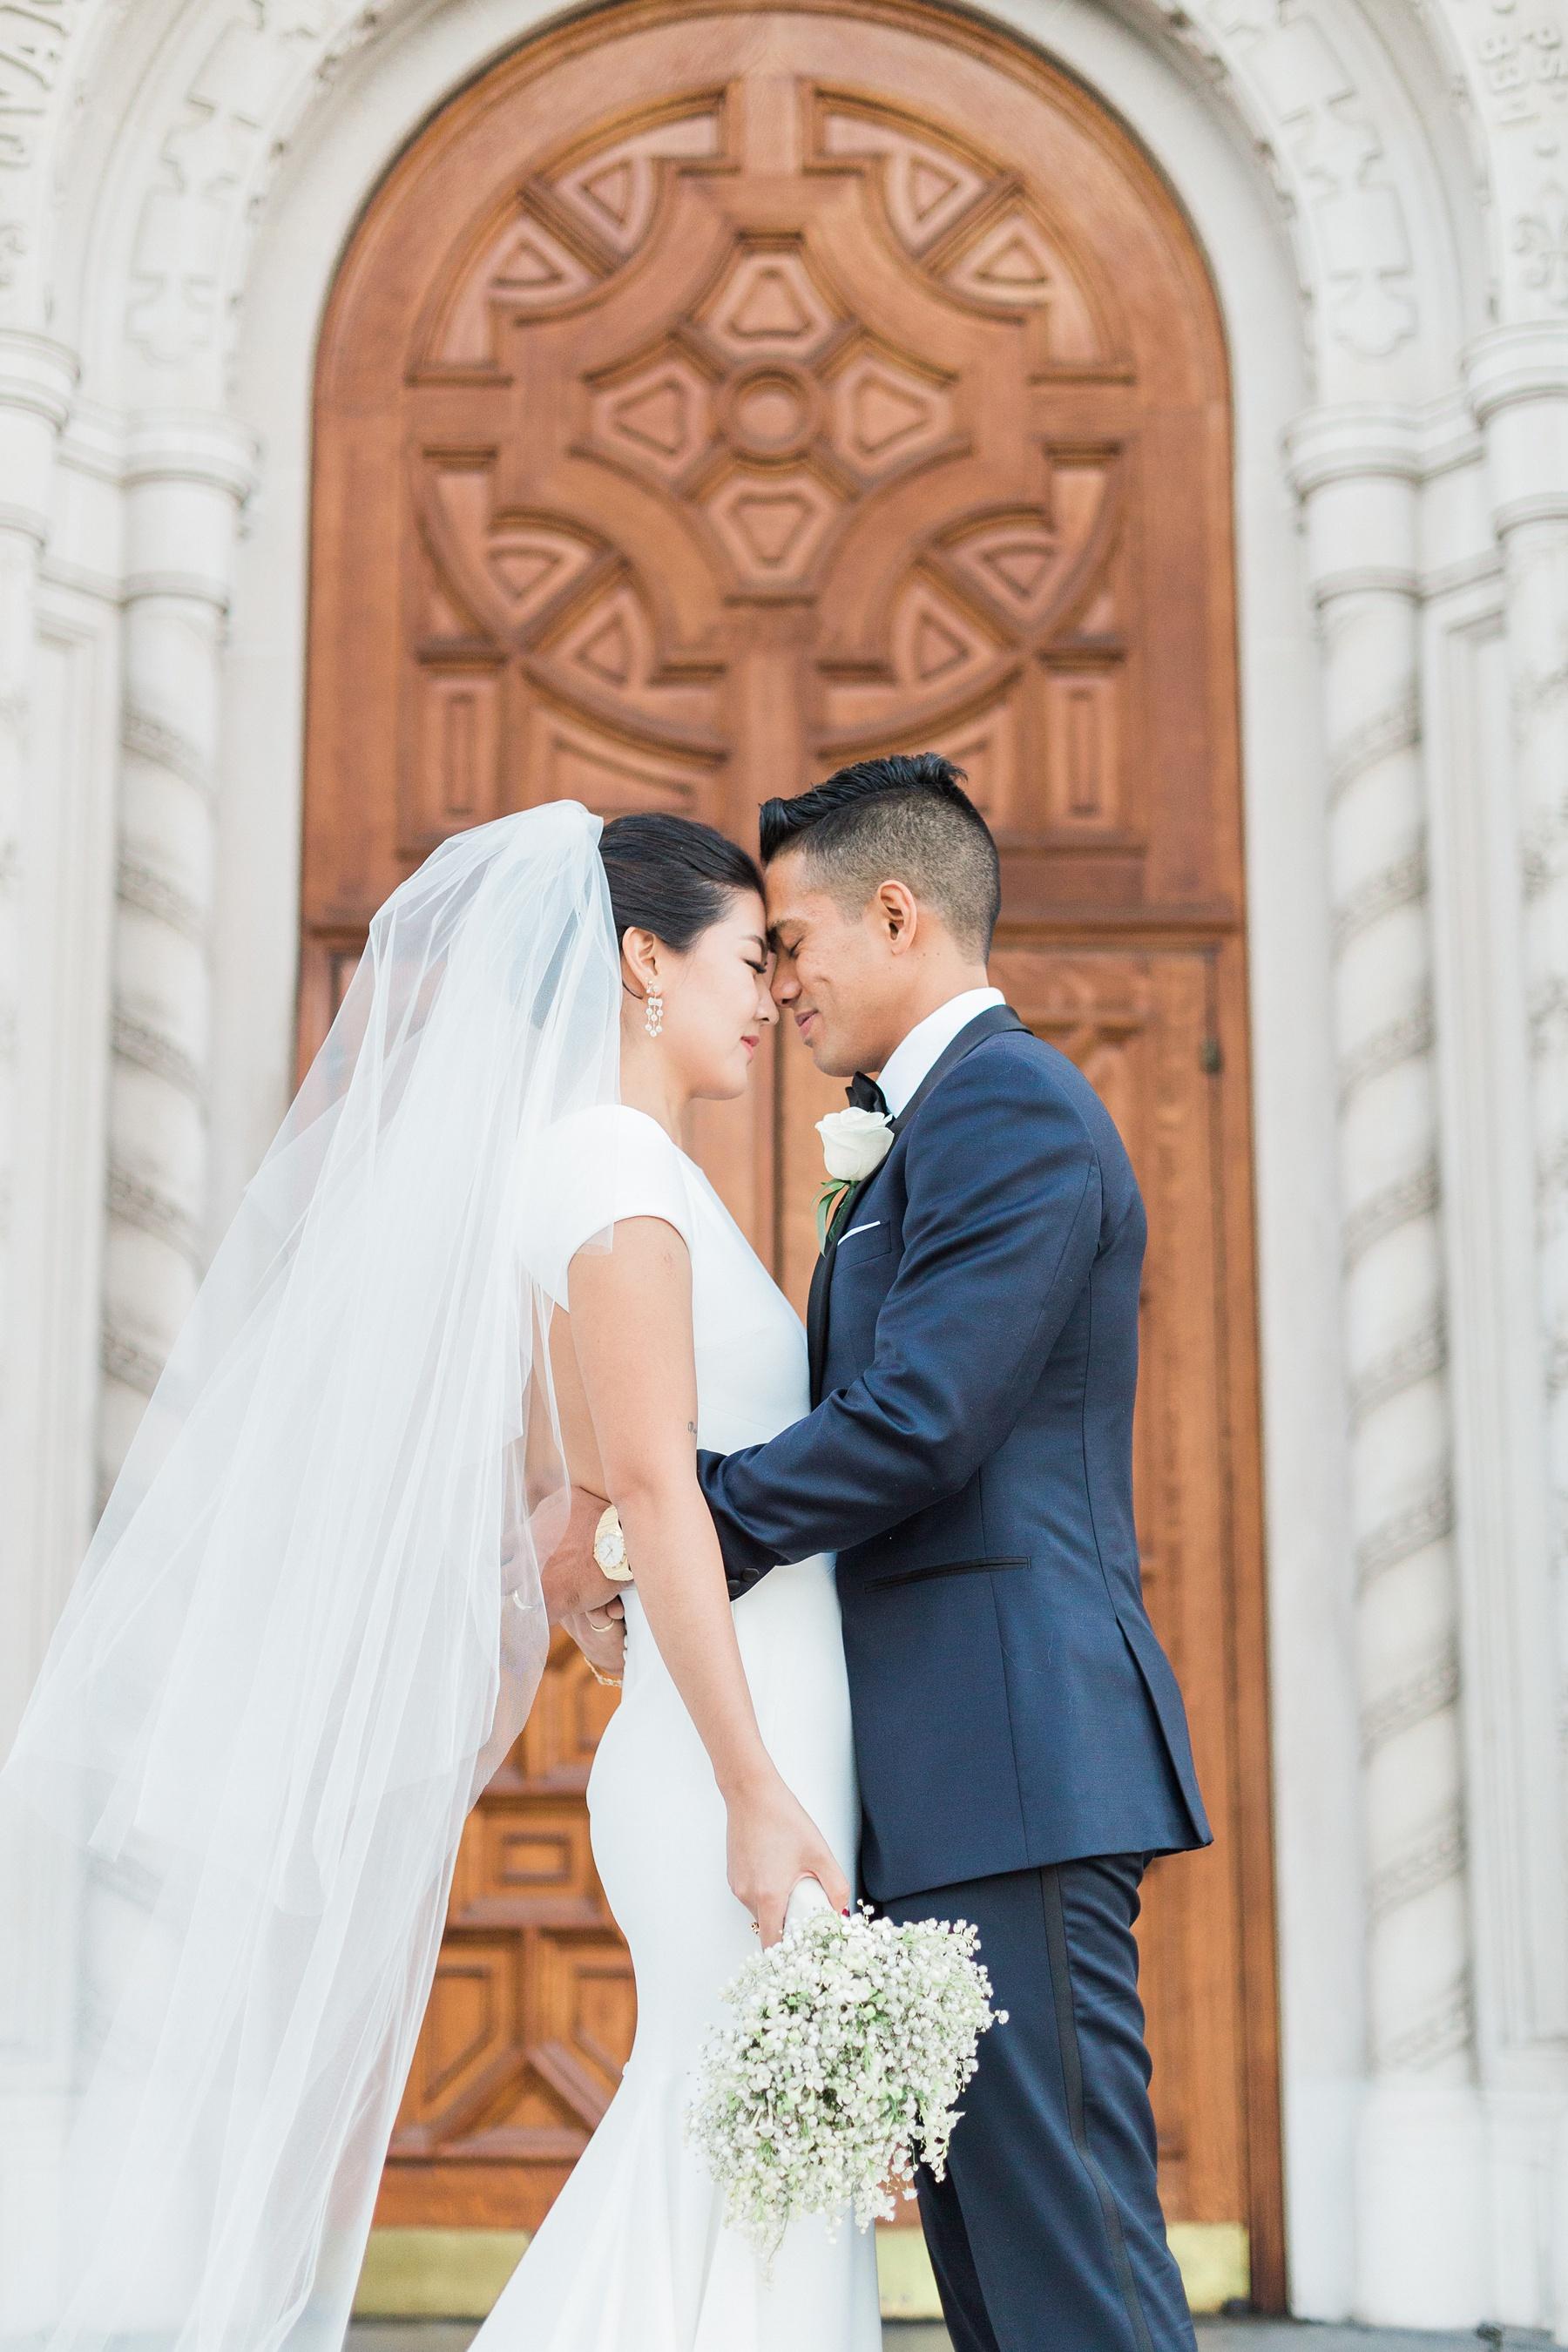 Urban DTLA Wedding at Millwick By Wedding Photographer Madison Ellis (62)